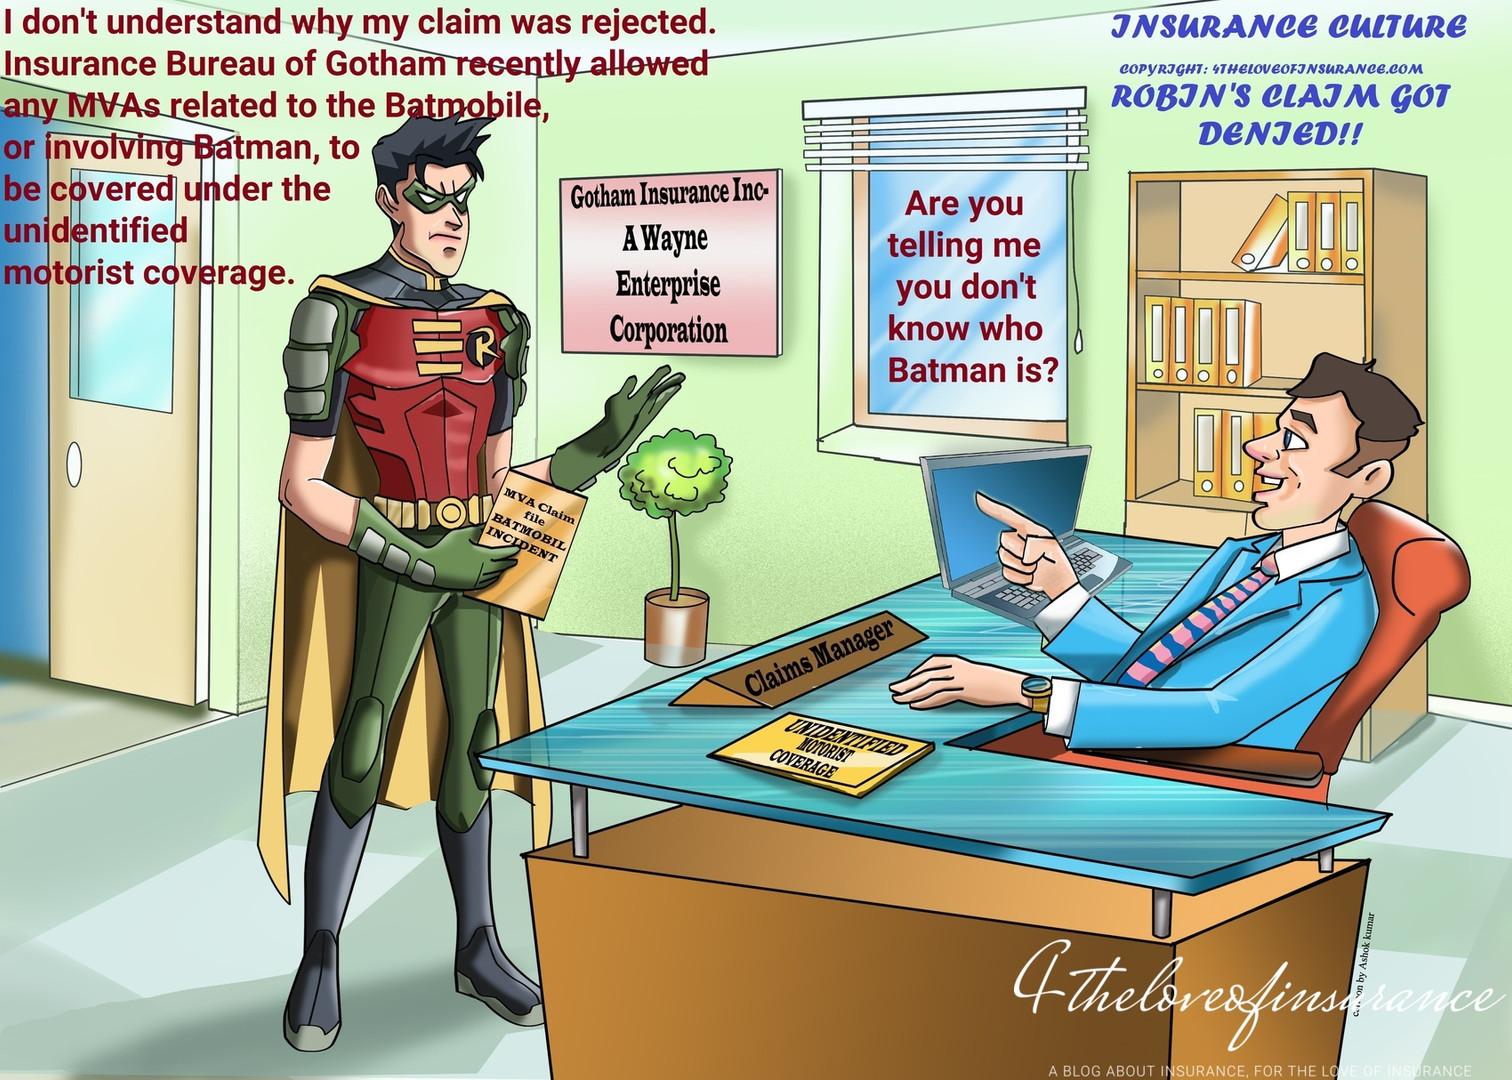 Robin's Claim